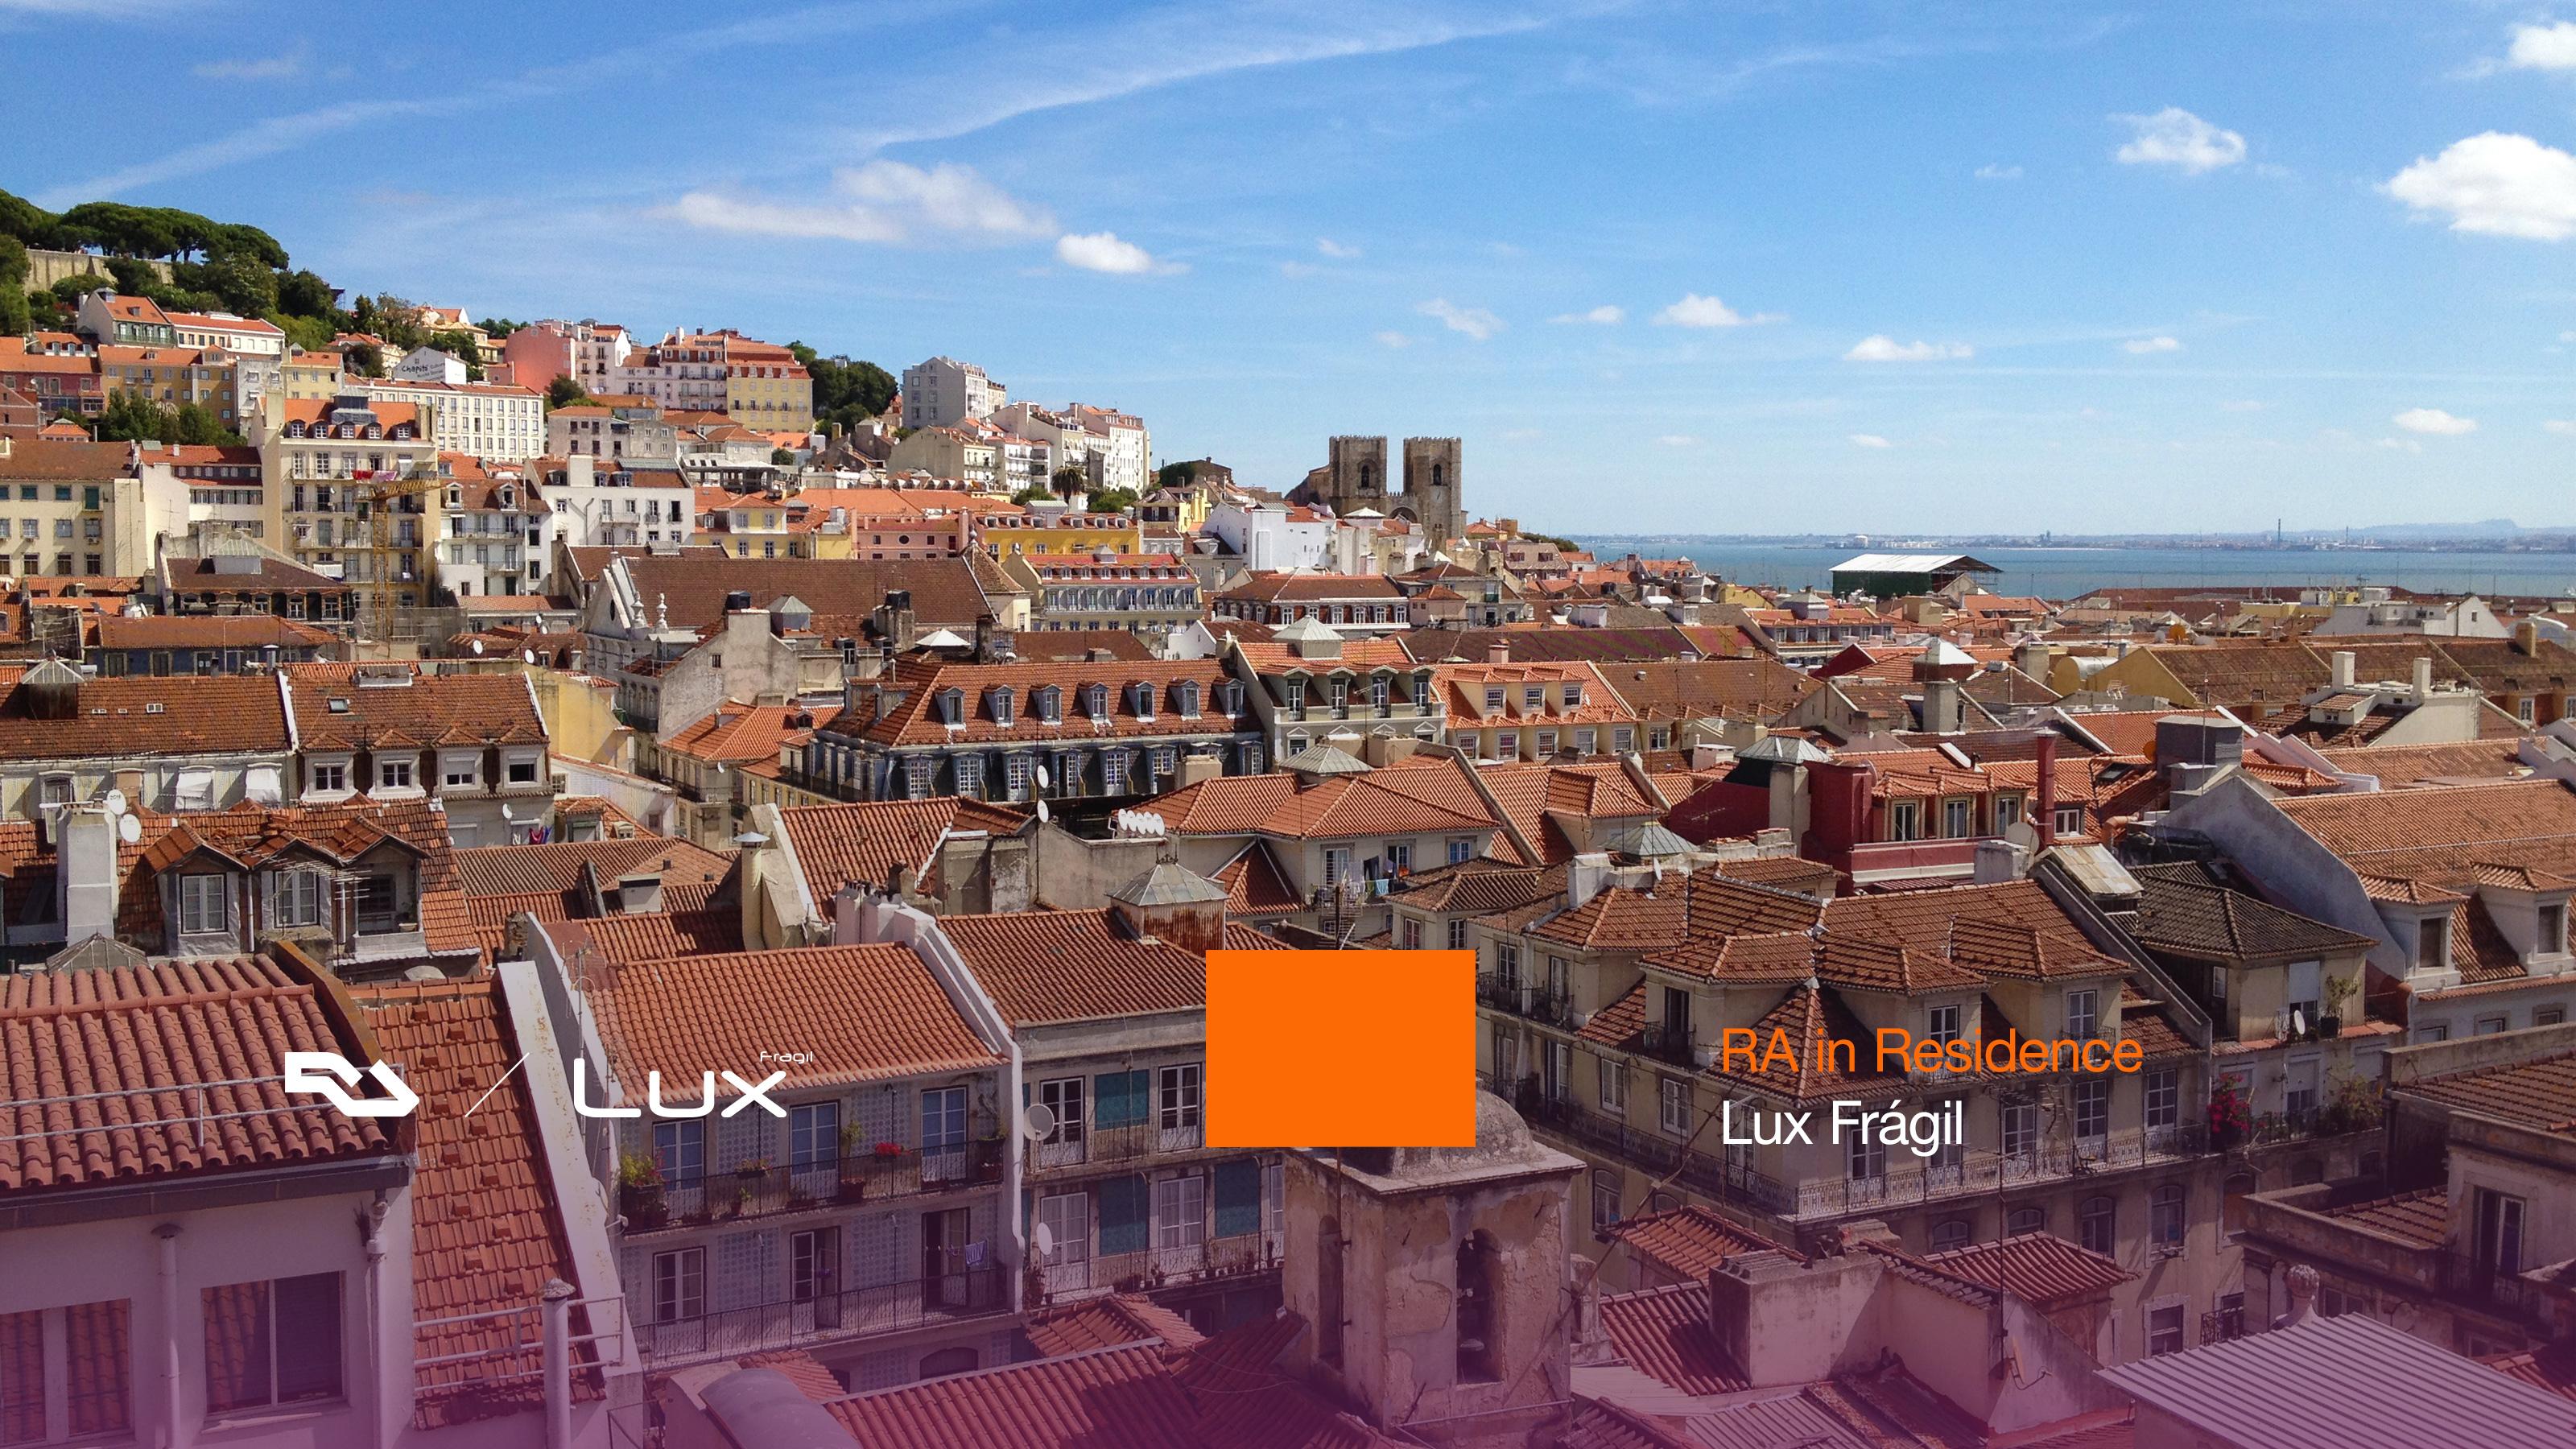 RA In Residence: Lux Frágil